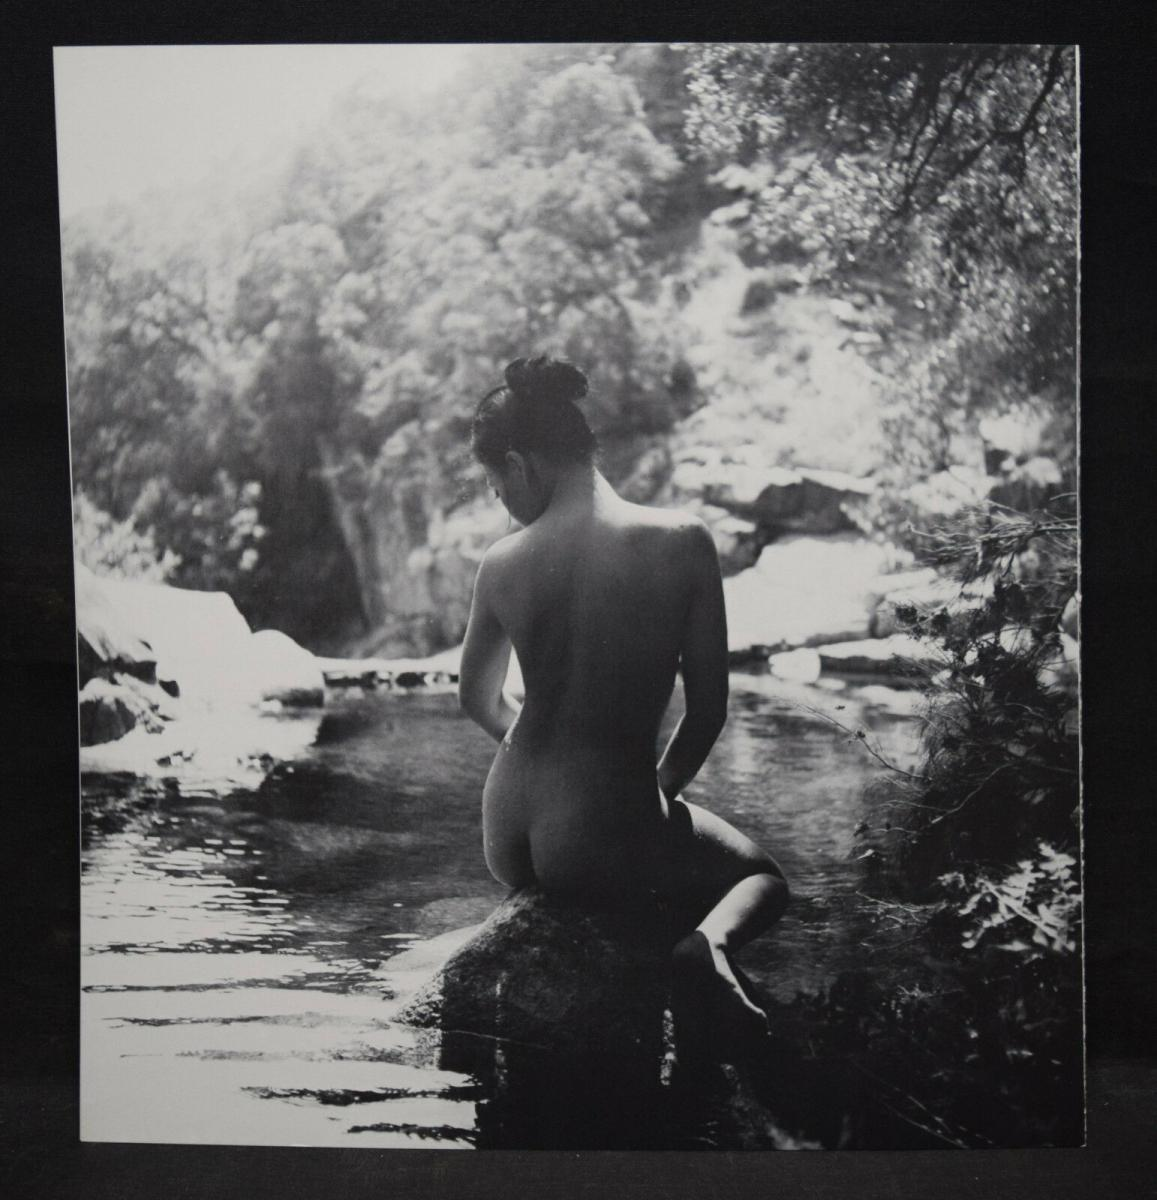 ANDRÉ KRETZ - CANTATE A NAUSICAA - WIDMUNG - ORIGINALZEICHNUNG - 1980 - FOTOS 7